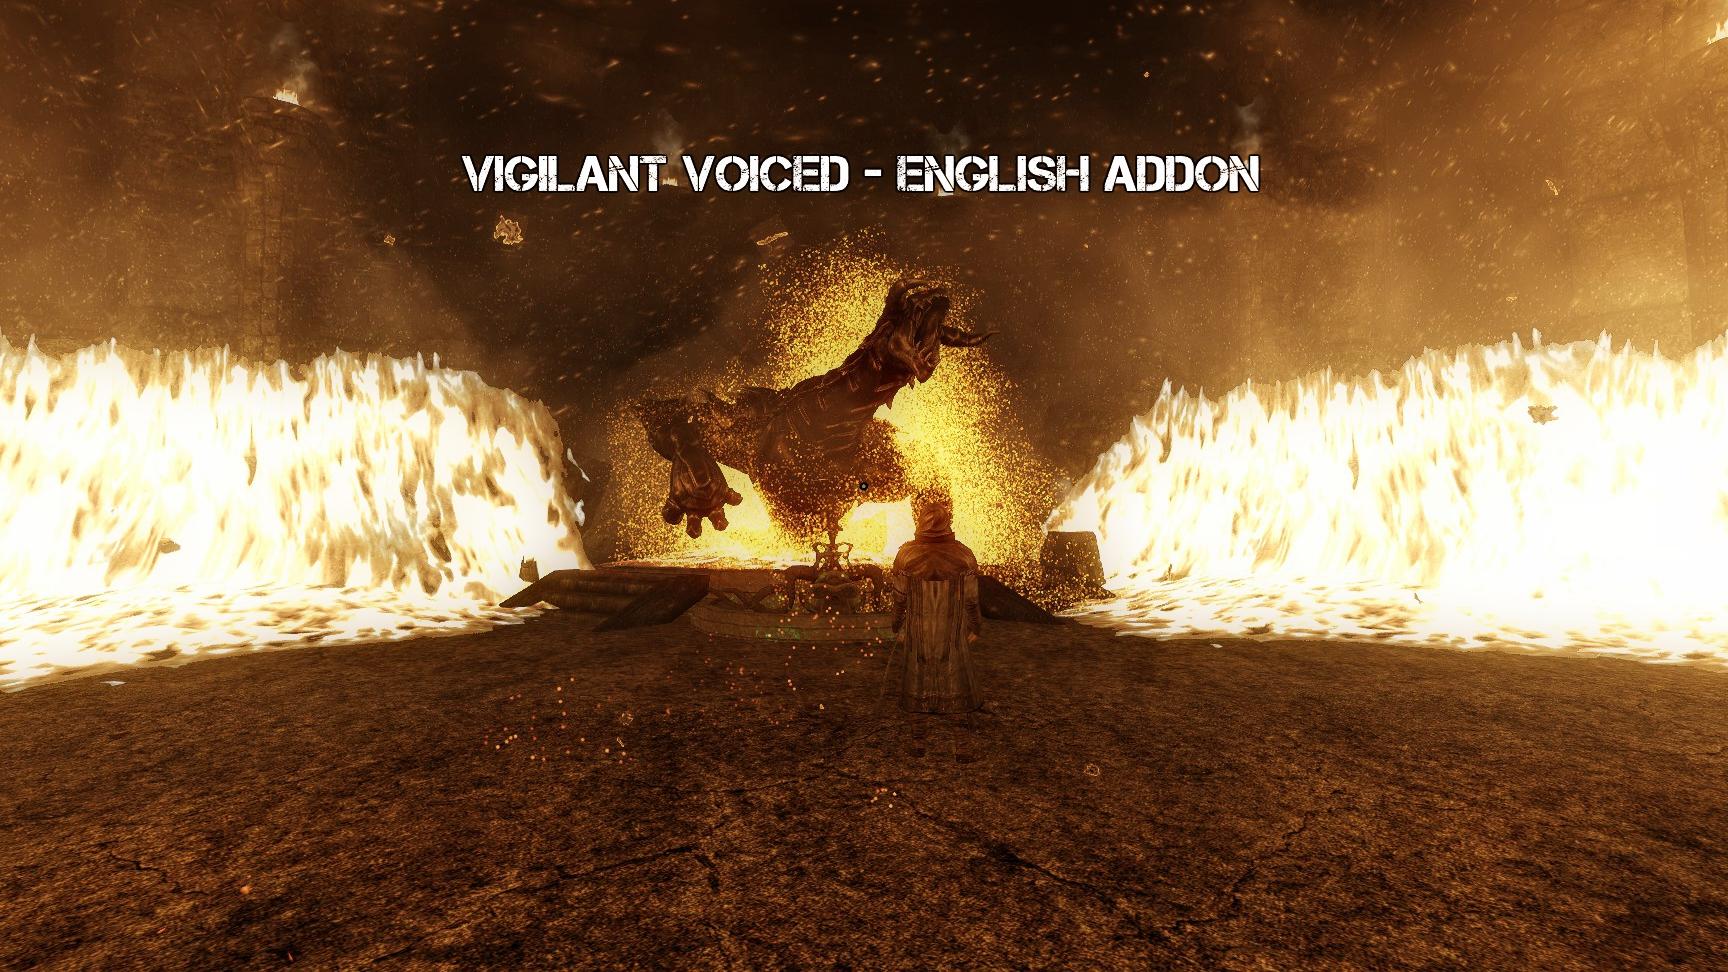 Vigilant Voiced - English Addon